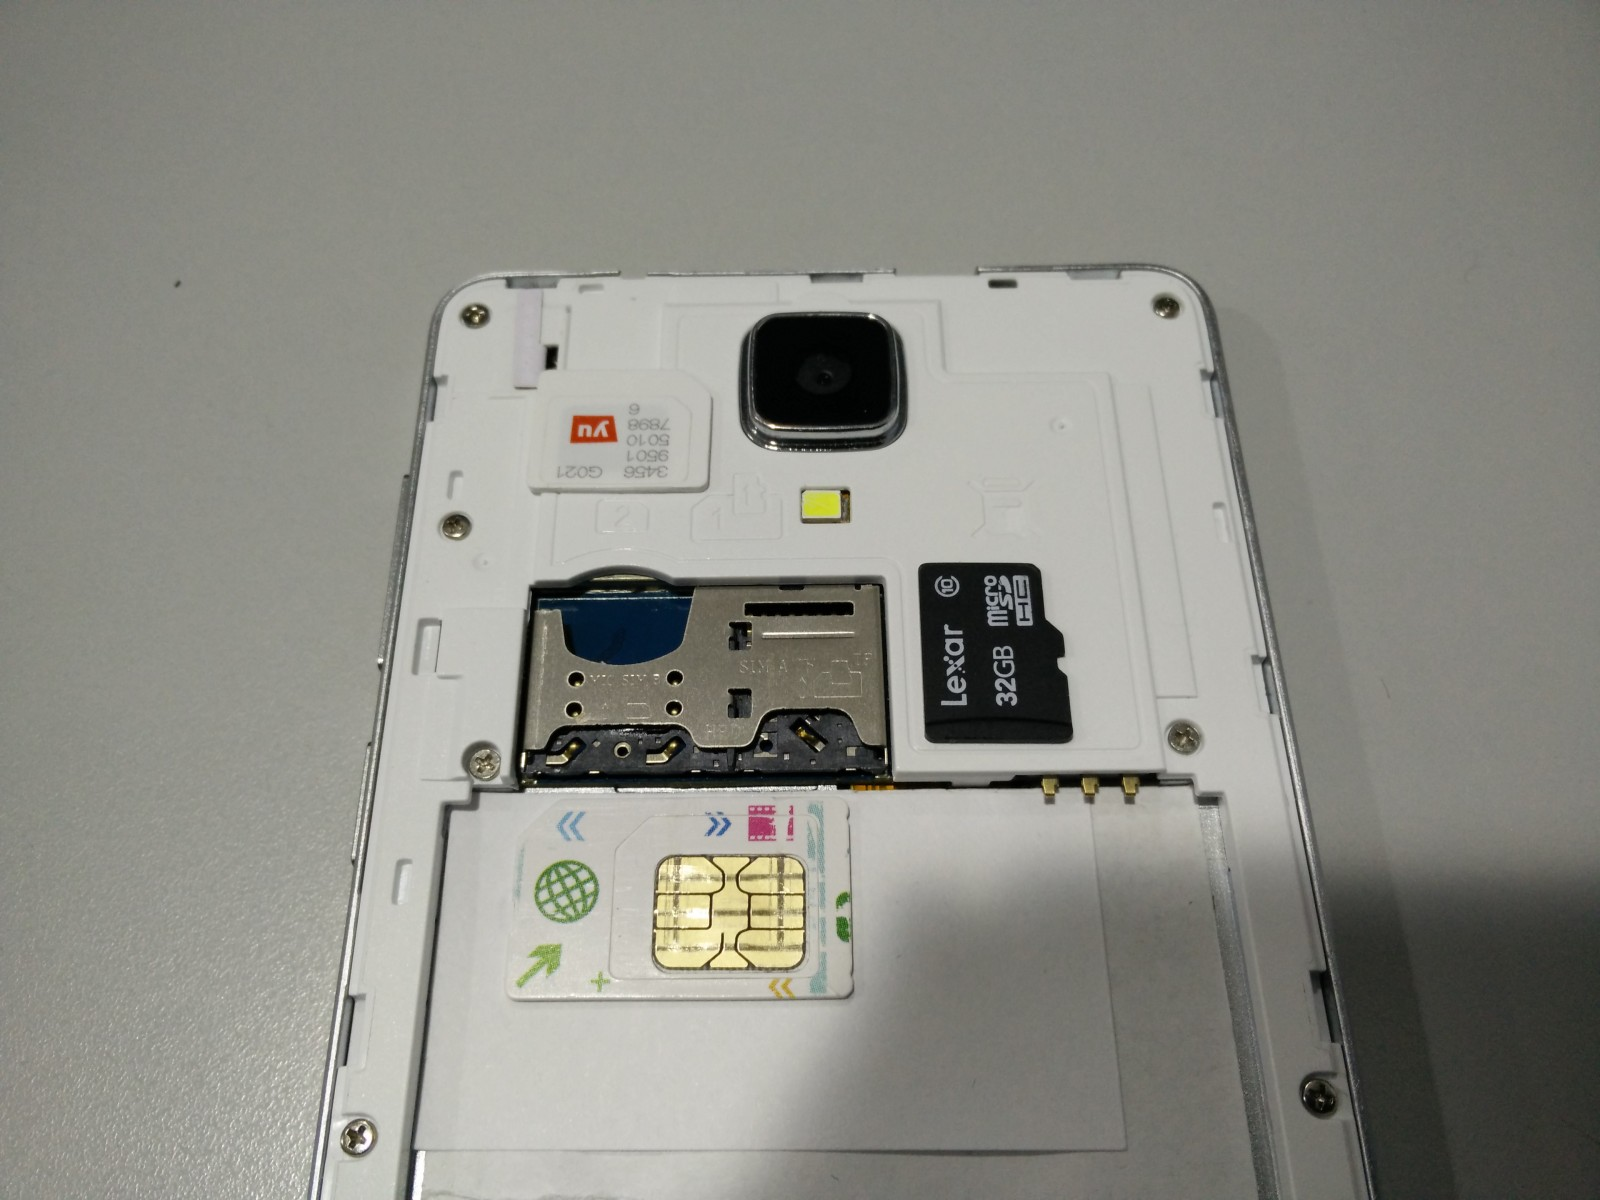 Introducir Tarjeta SIM Ortgqv